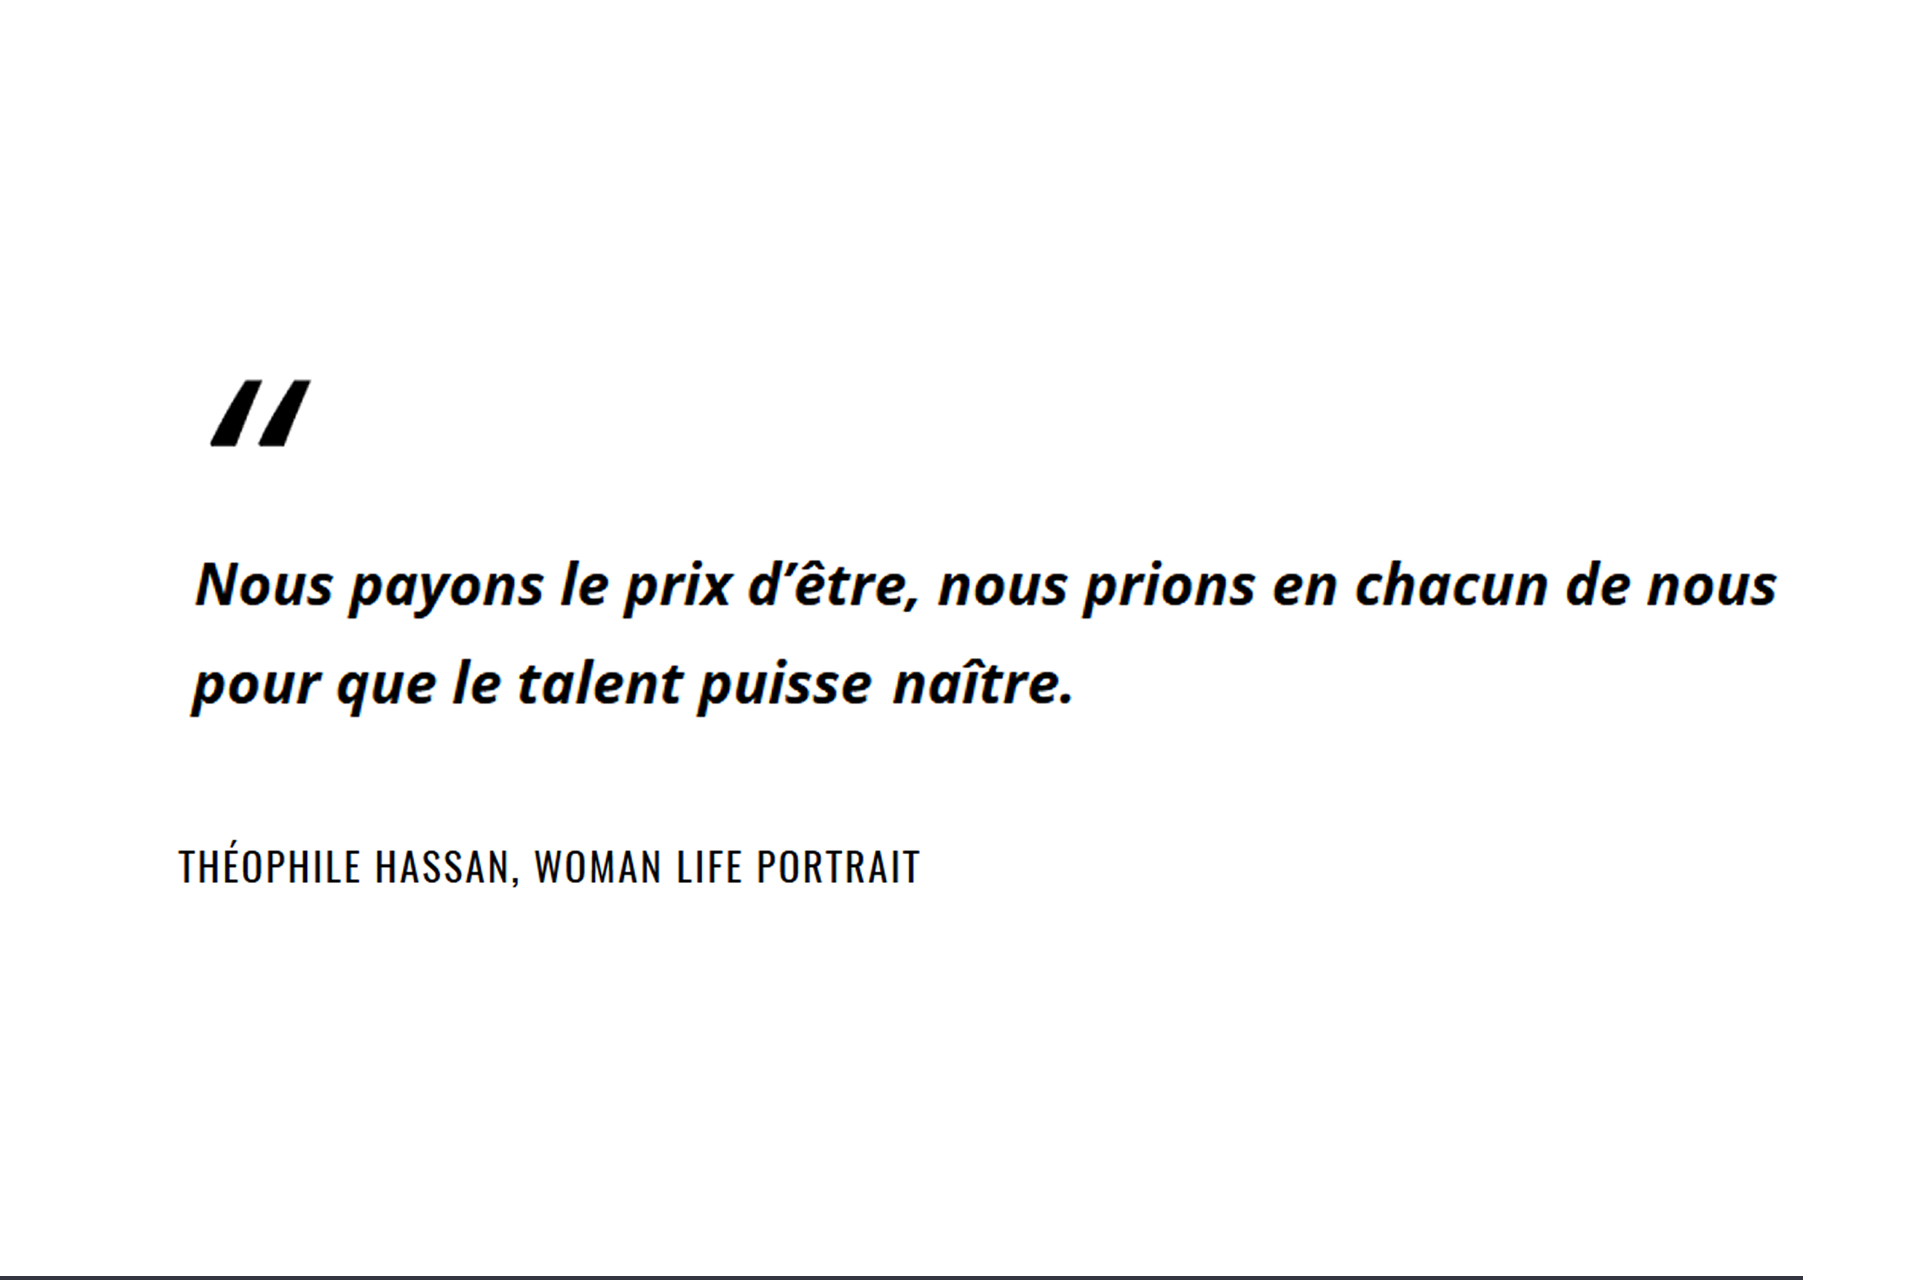 Citation Hassan writer